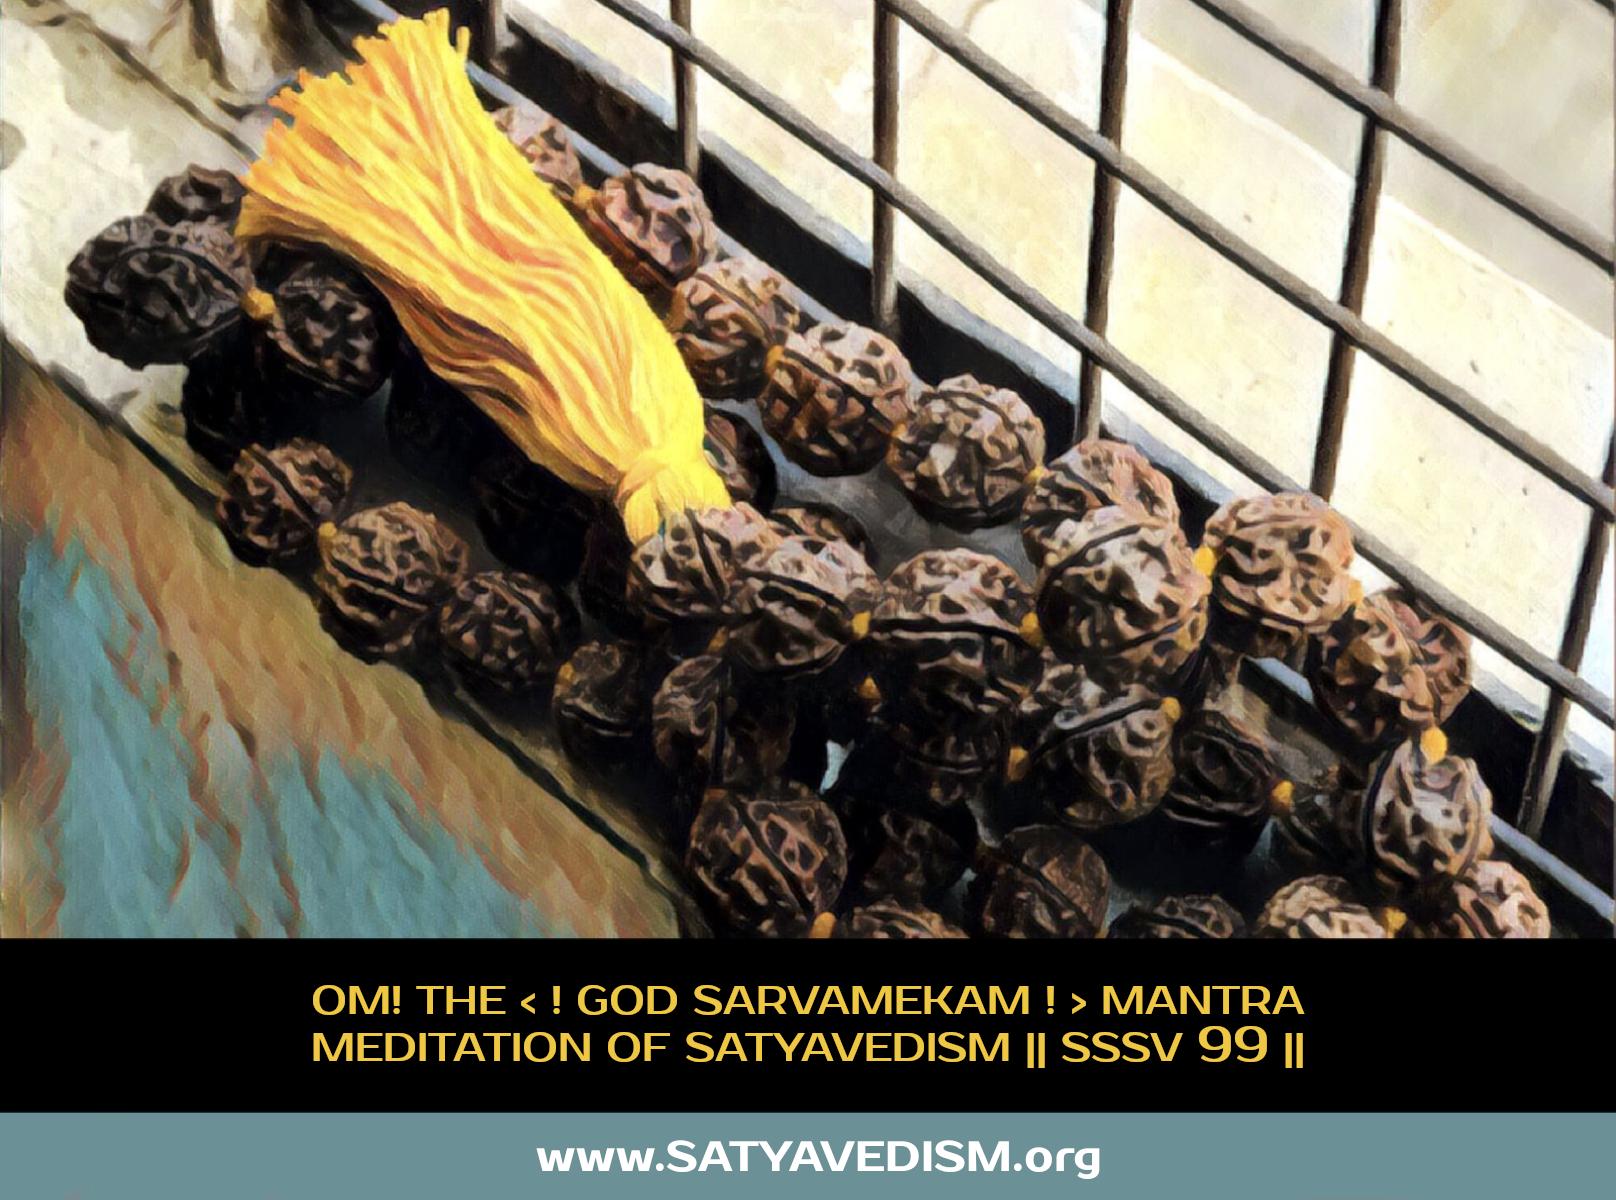 THE PANCHVANDANAM | MANTRA | JAPAMALA DHYANA || PVSSV 11 || ➤➤